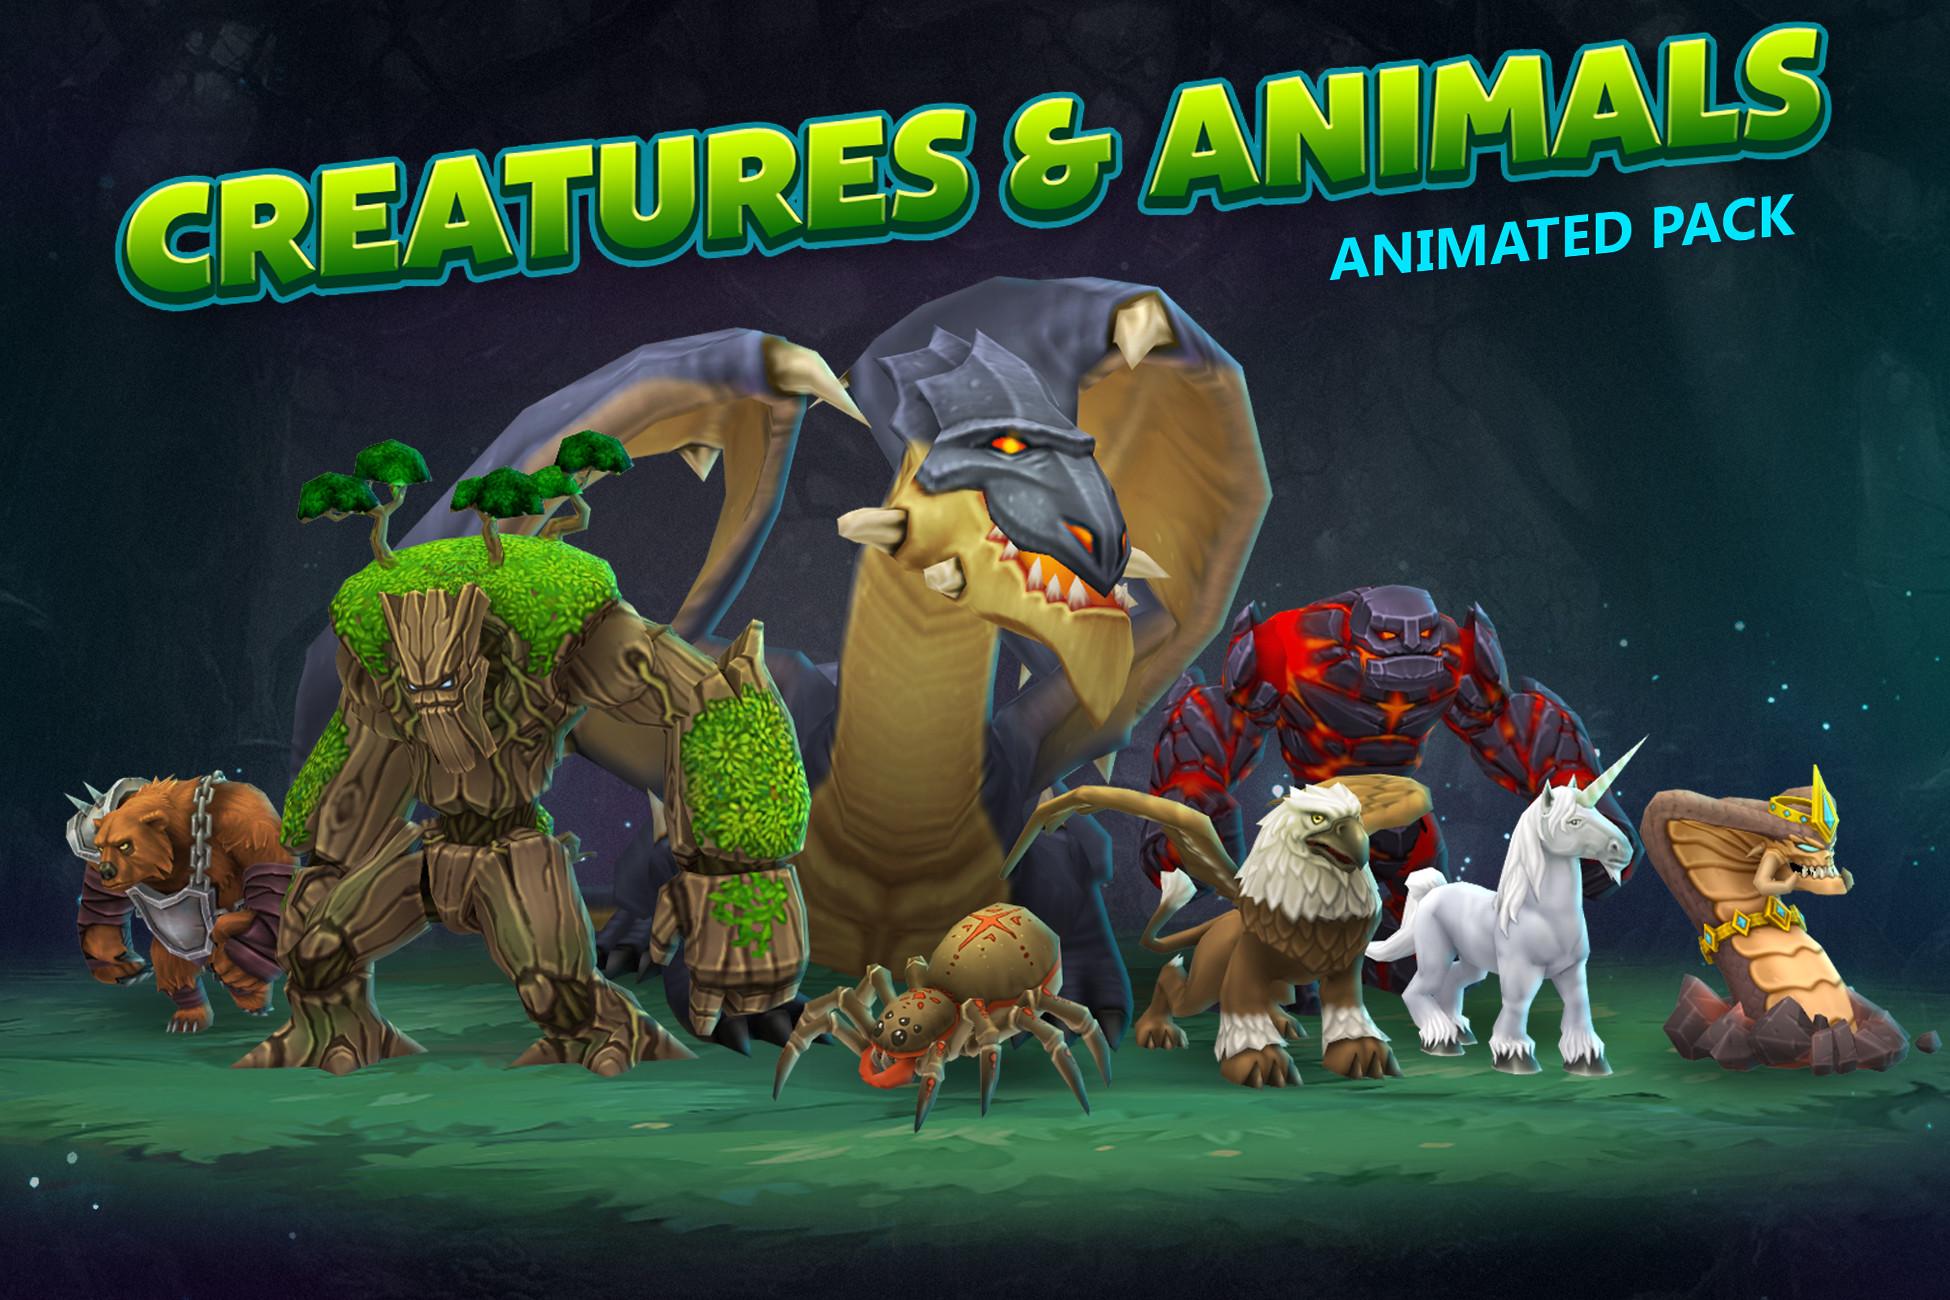 Creatures & animals animated pack